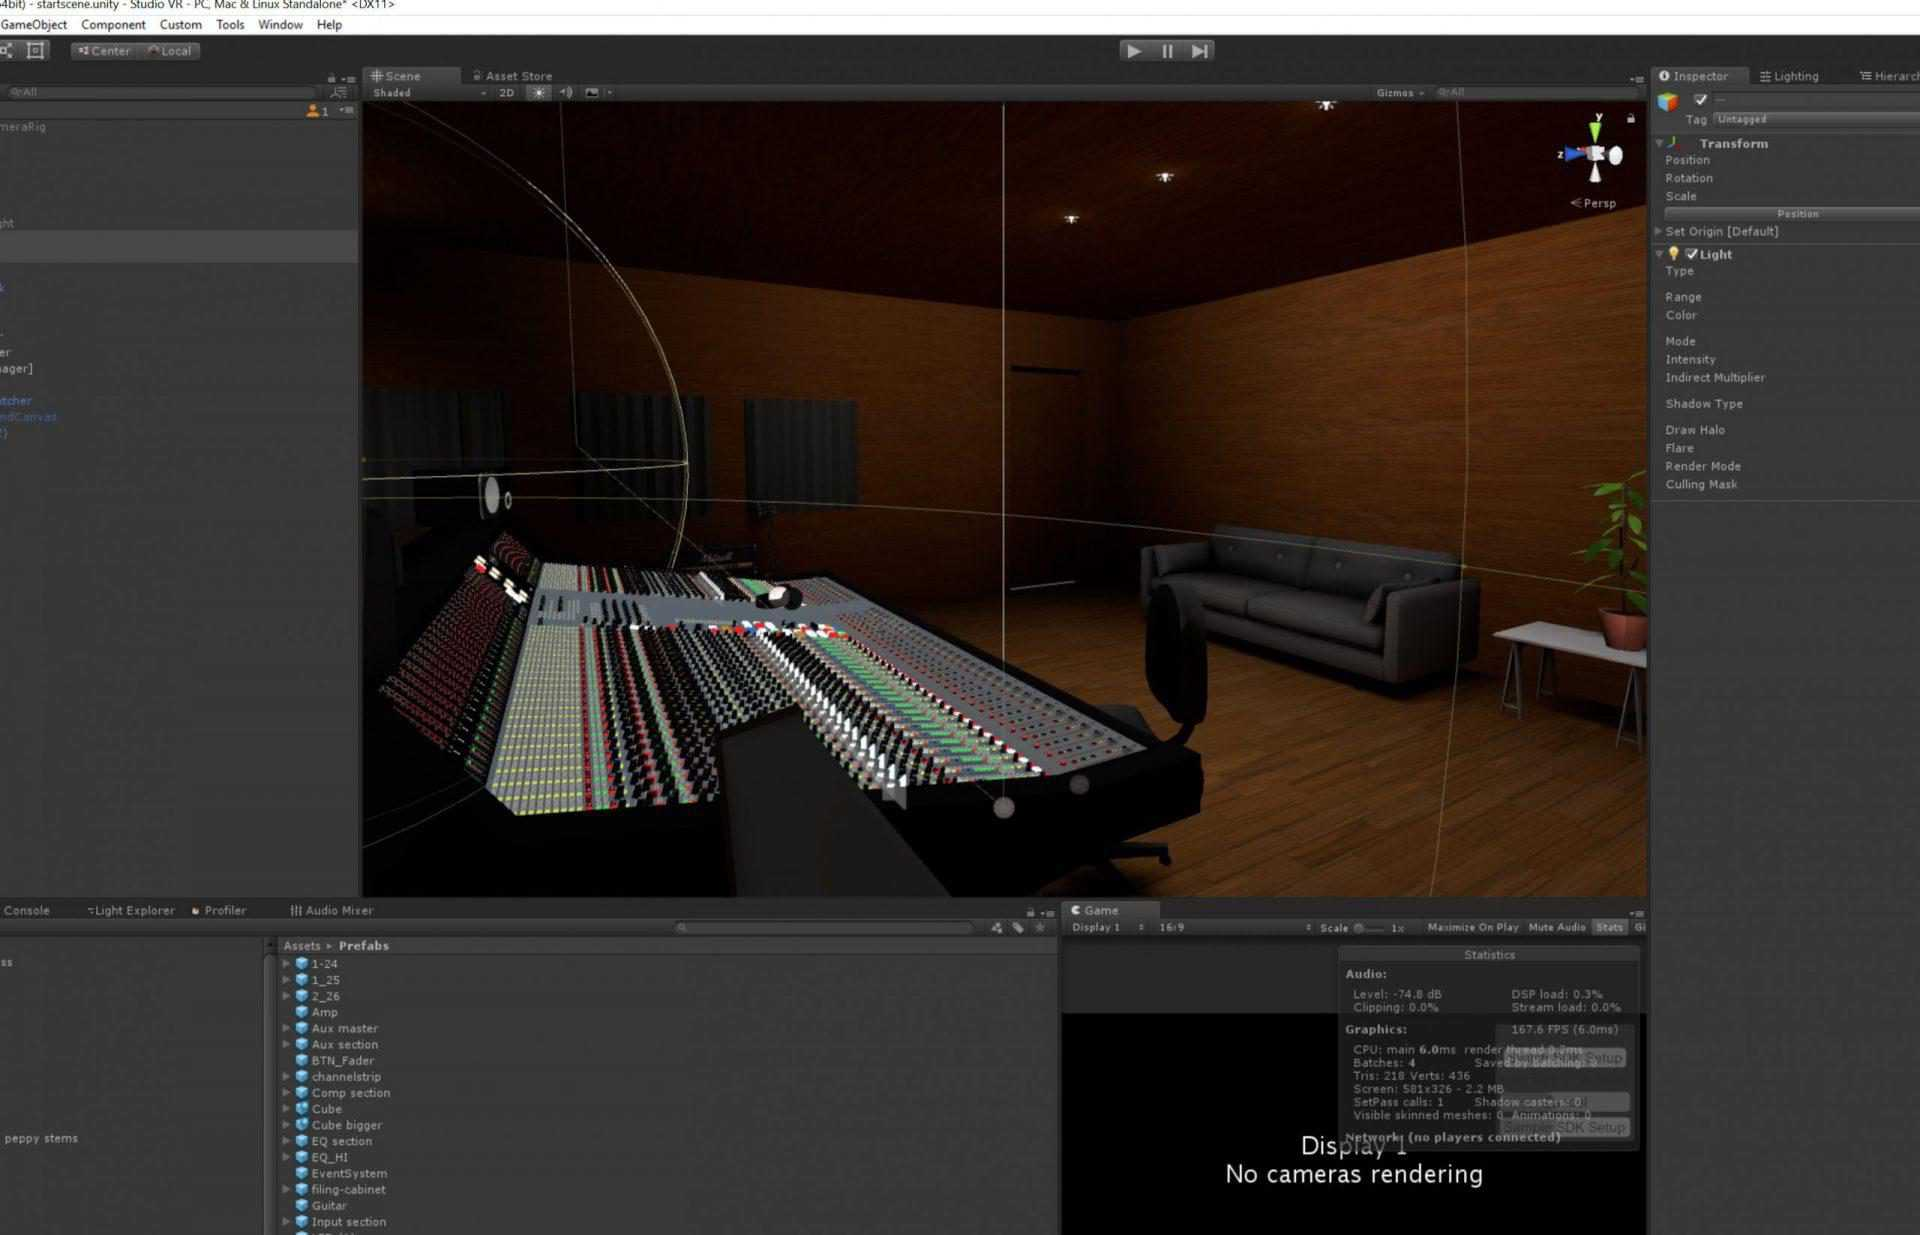 BTS VR recording studio